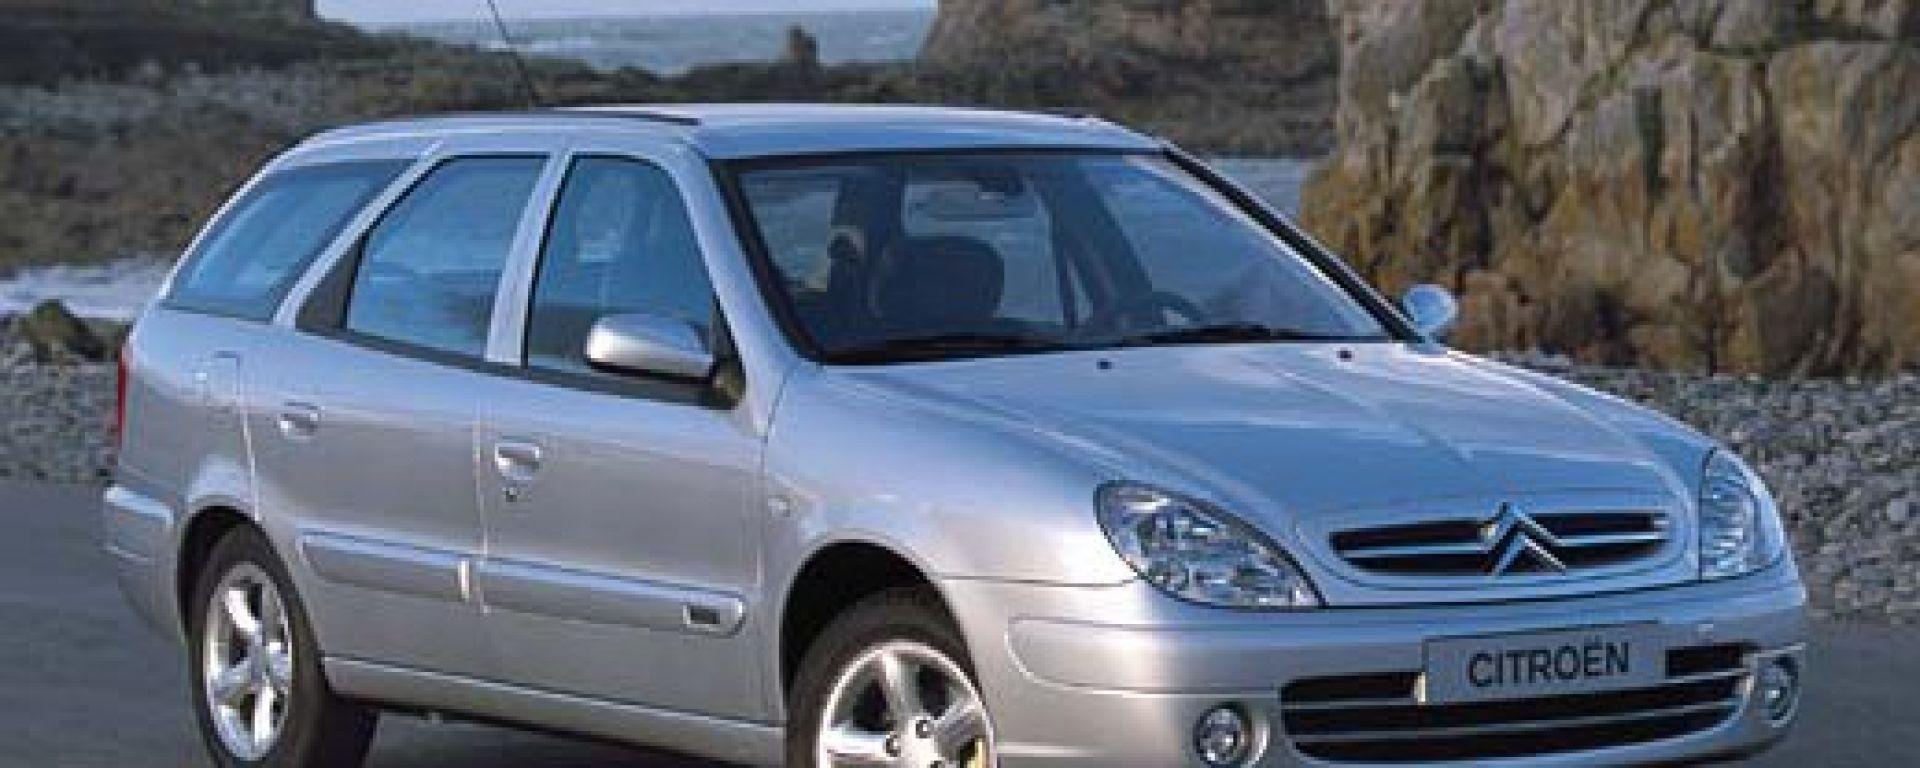 Citroën Xsara 2003